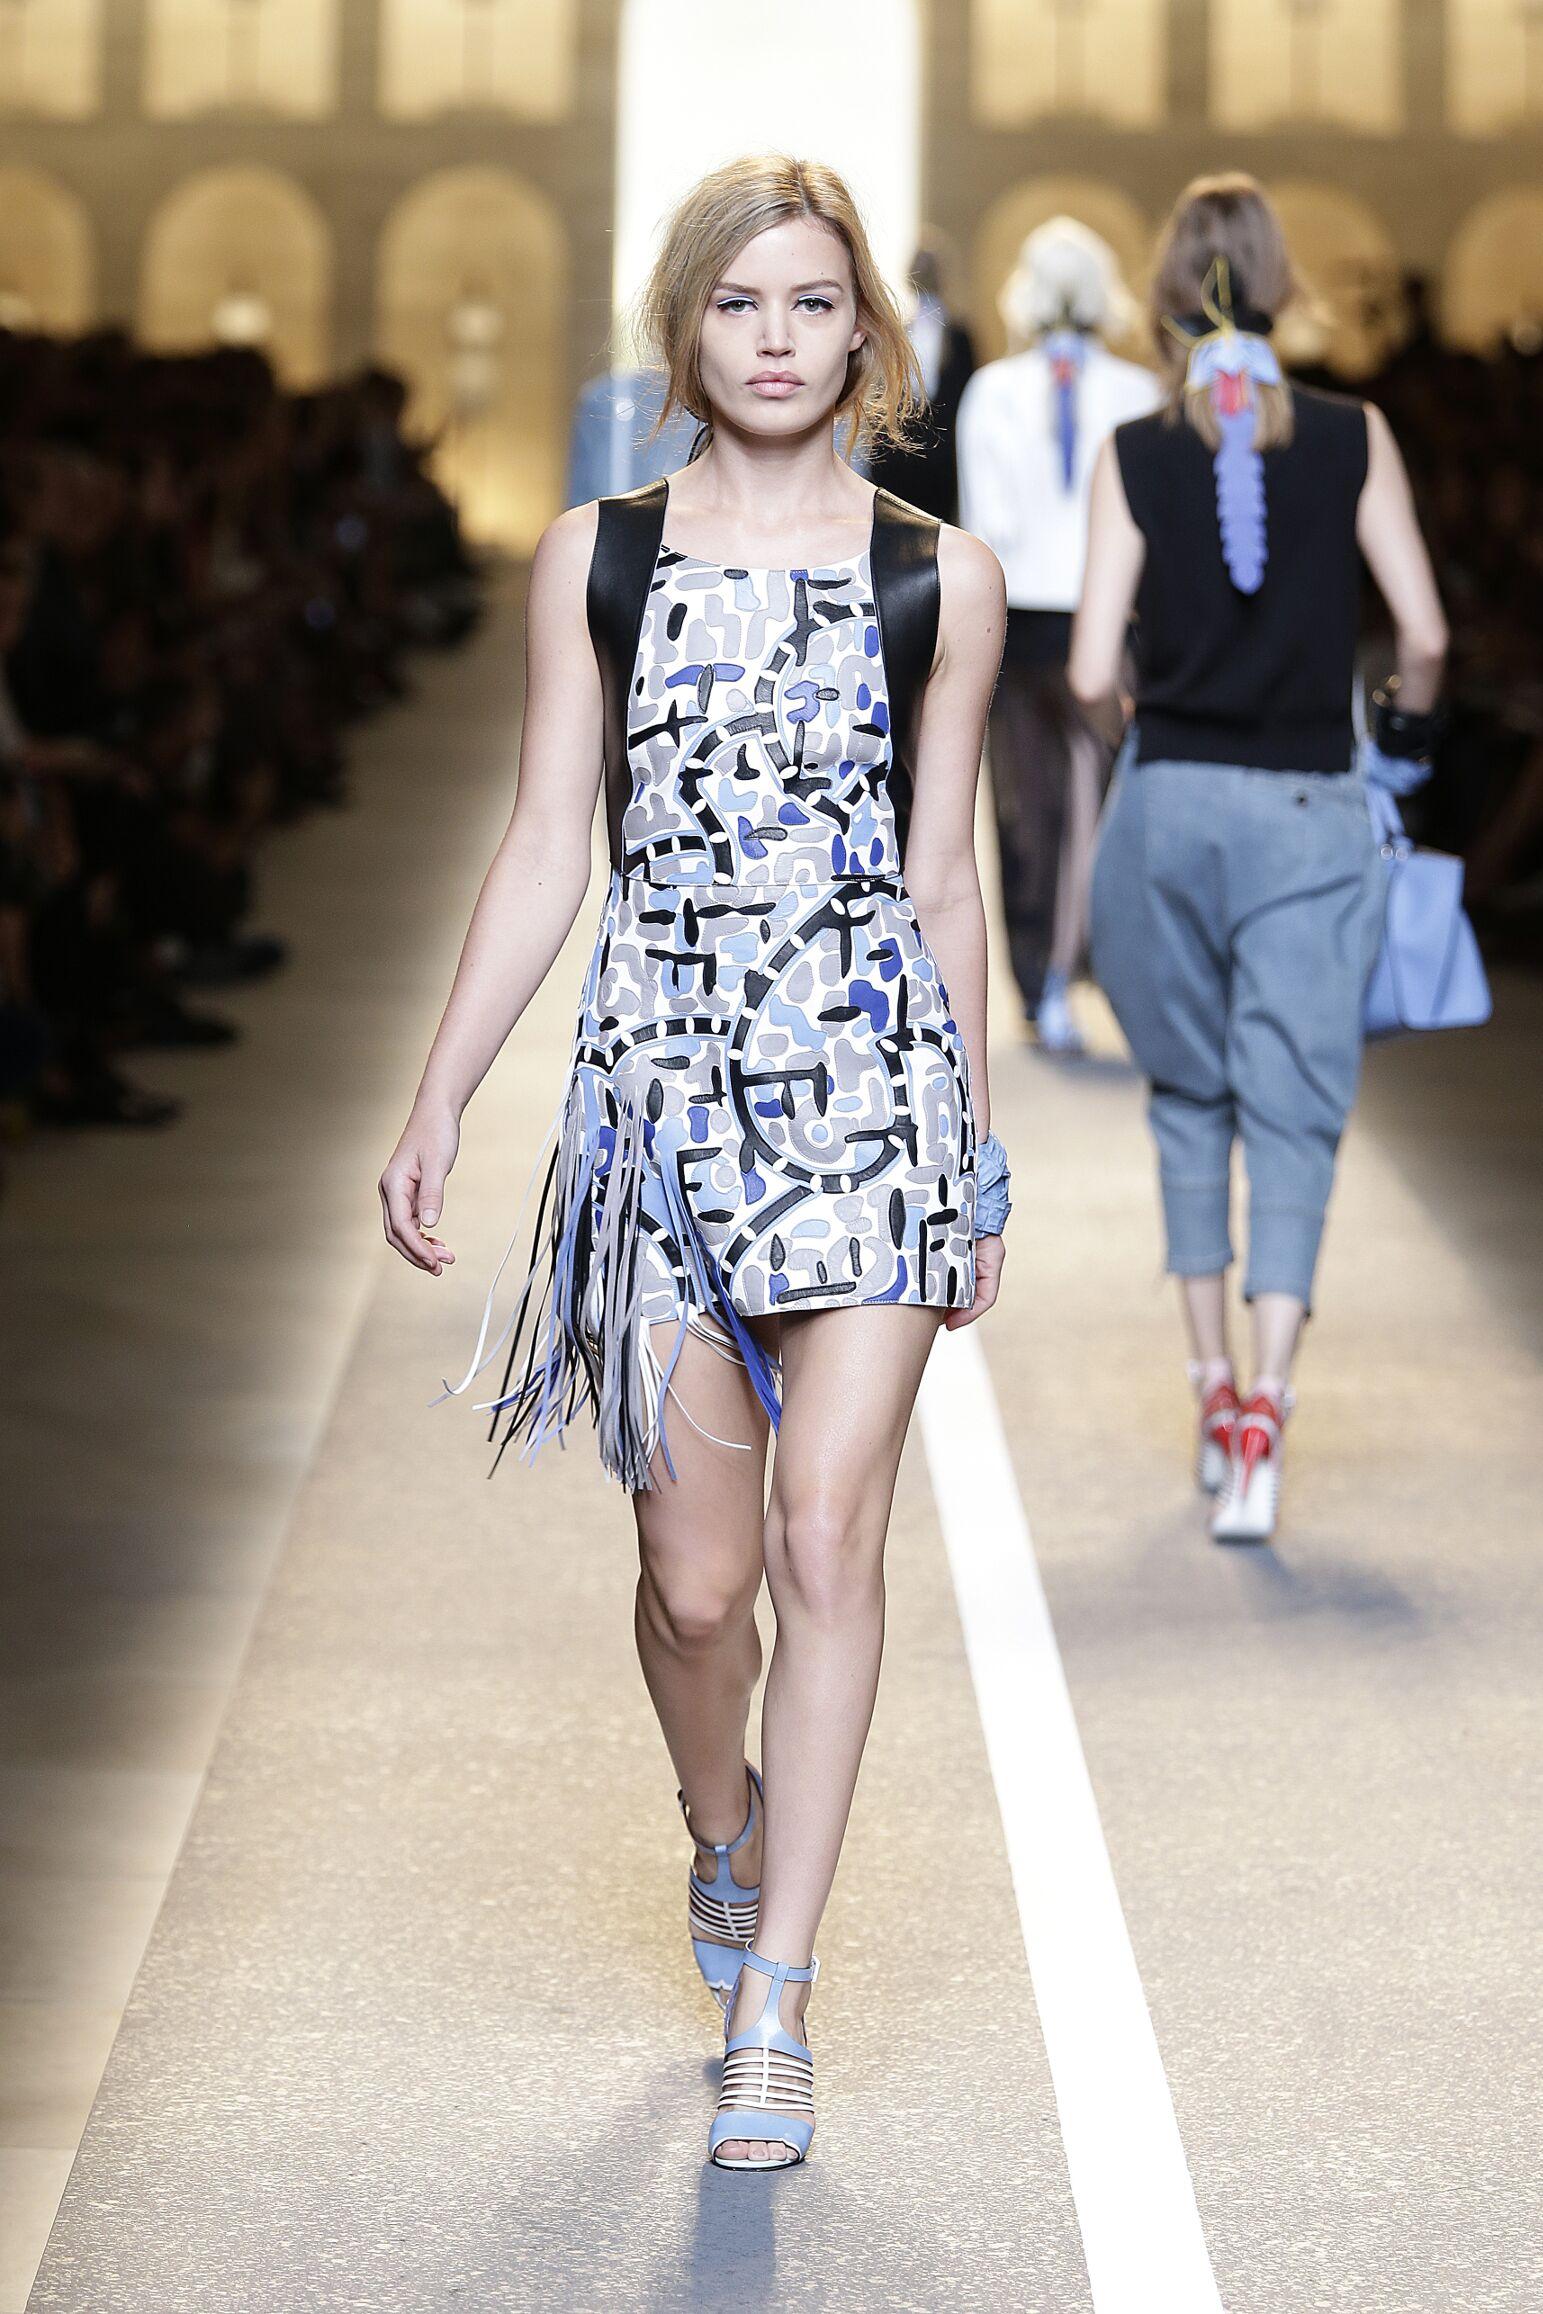 Fendi Summer 2015 Catwalk Womanswear